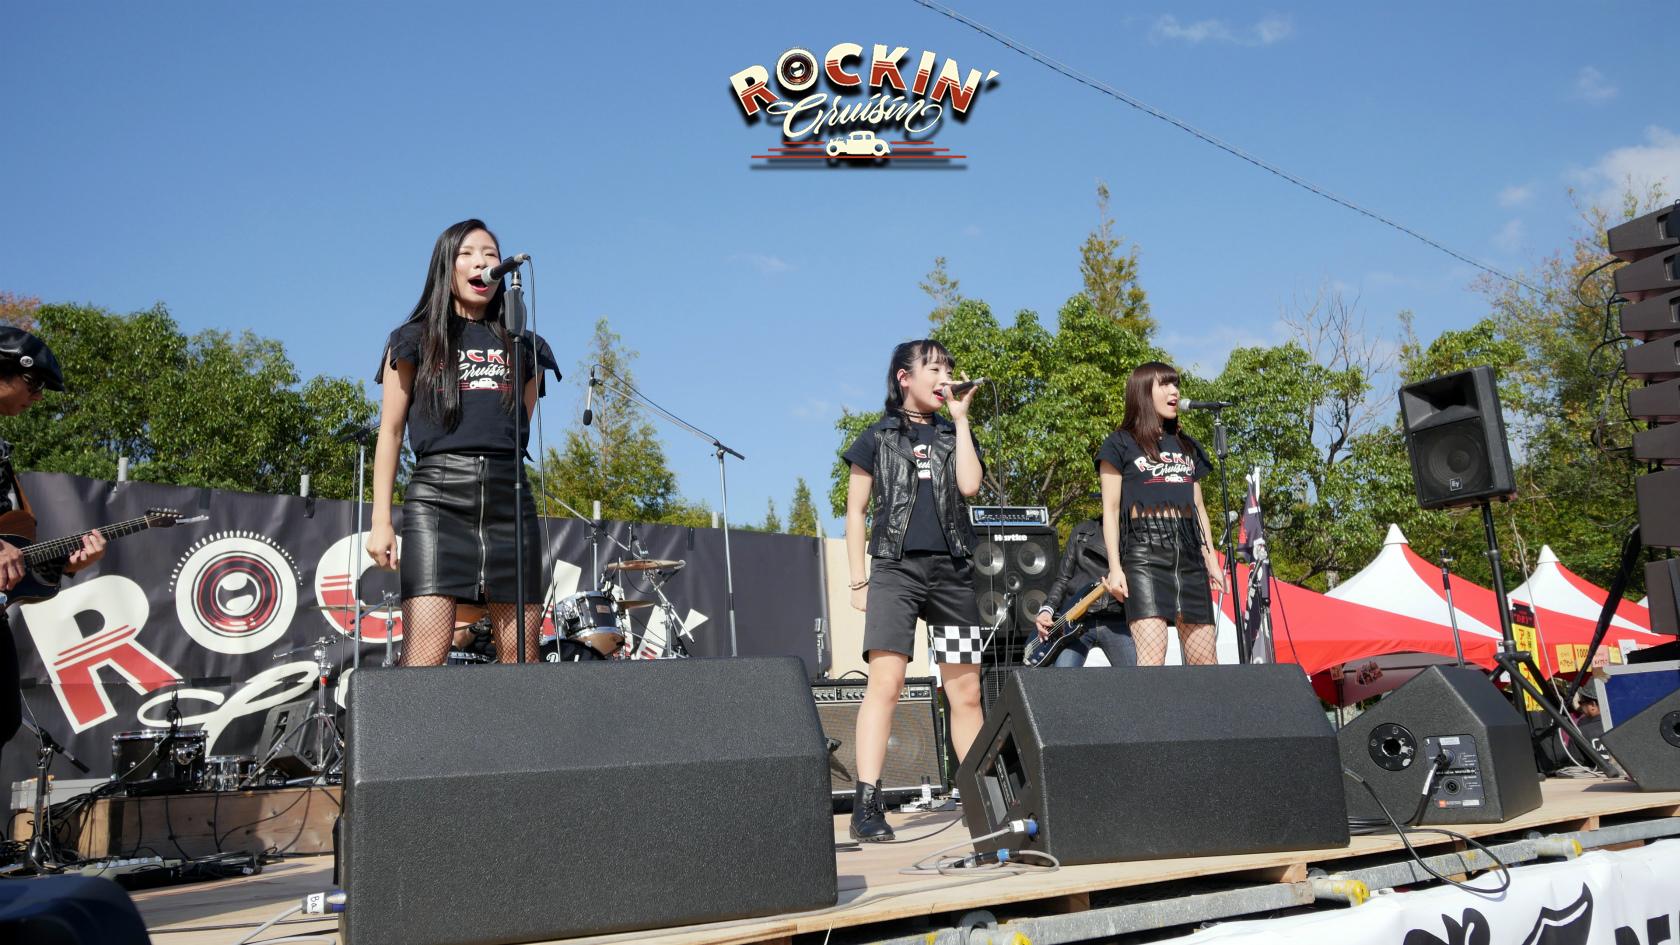 55-1-rockin11th_0651